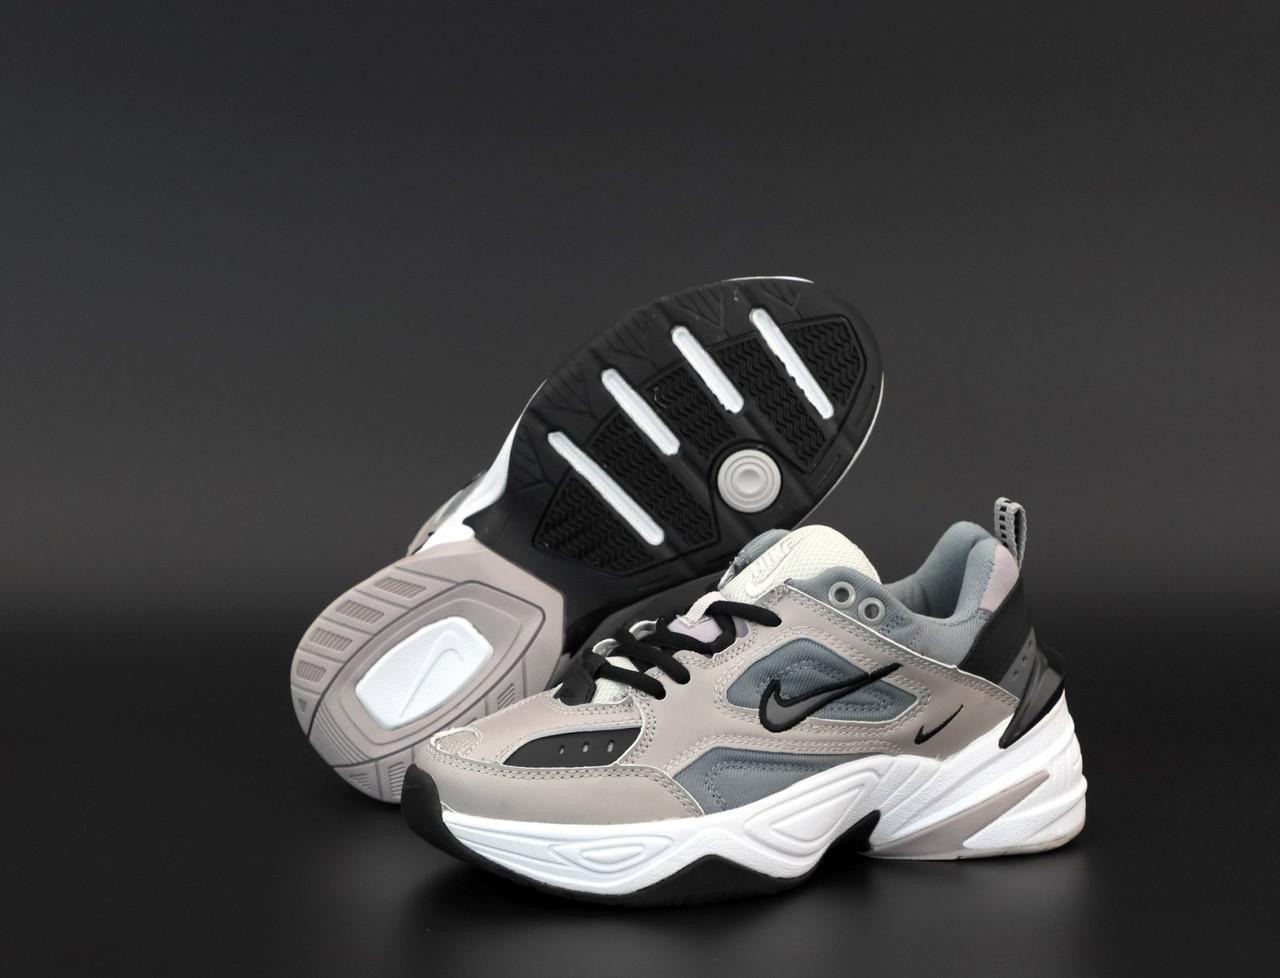 Женские кроссовки Nike M2K Tekno. Grey.  ТОП реплика ААА класса.